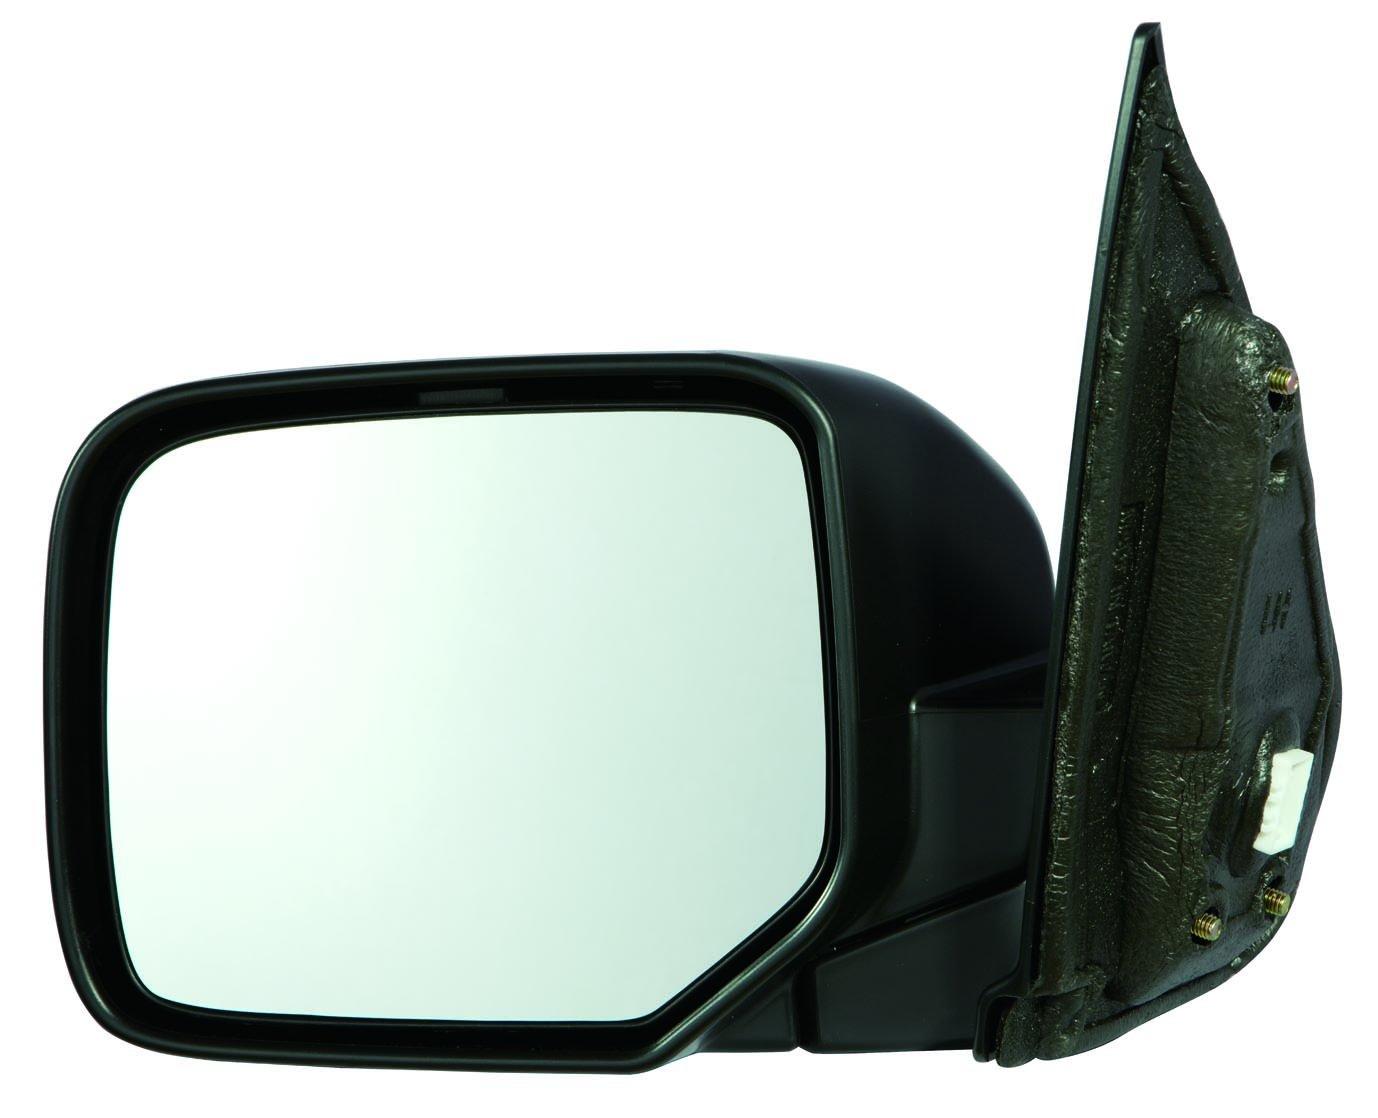 DEPO 317-5420L3EB1 Honda Pilot Driver Side Textured Non-Heated Power Mirror оптика depo спб